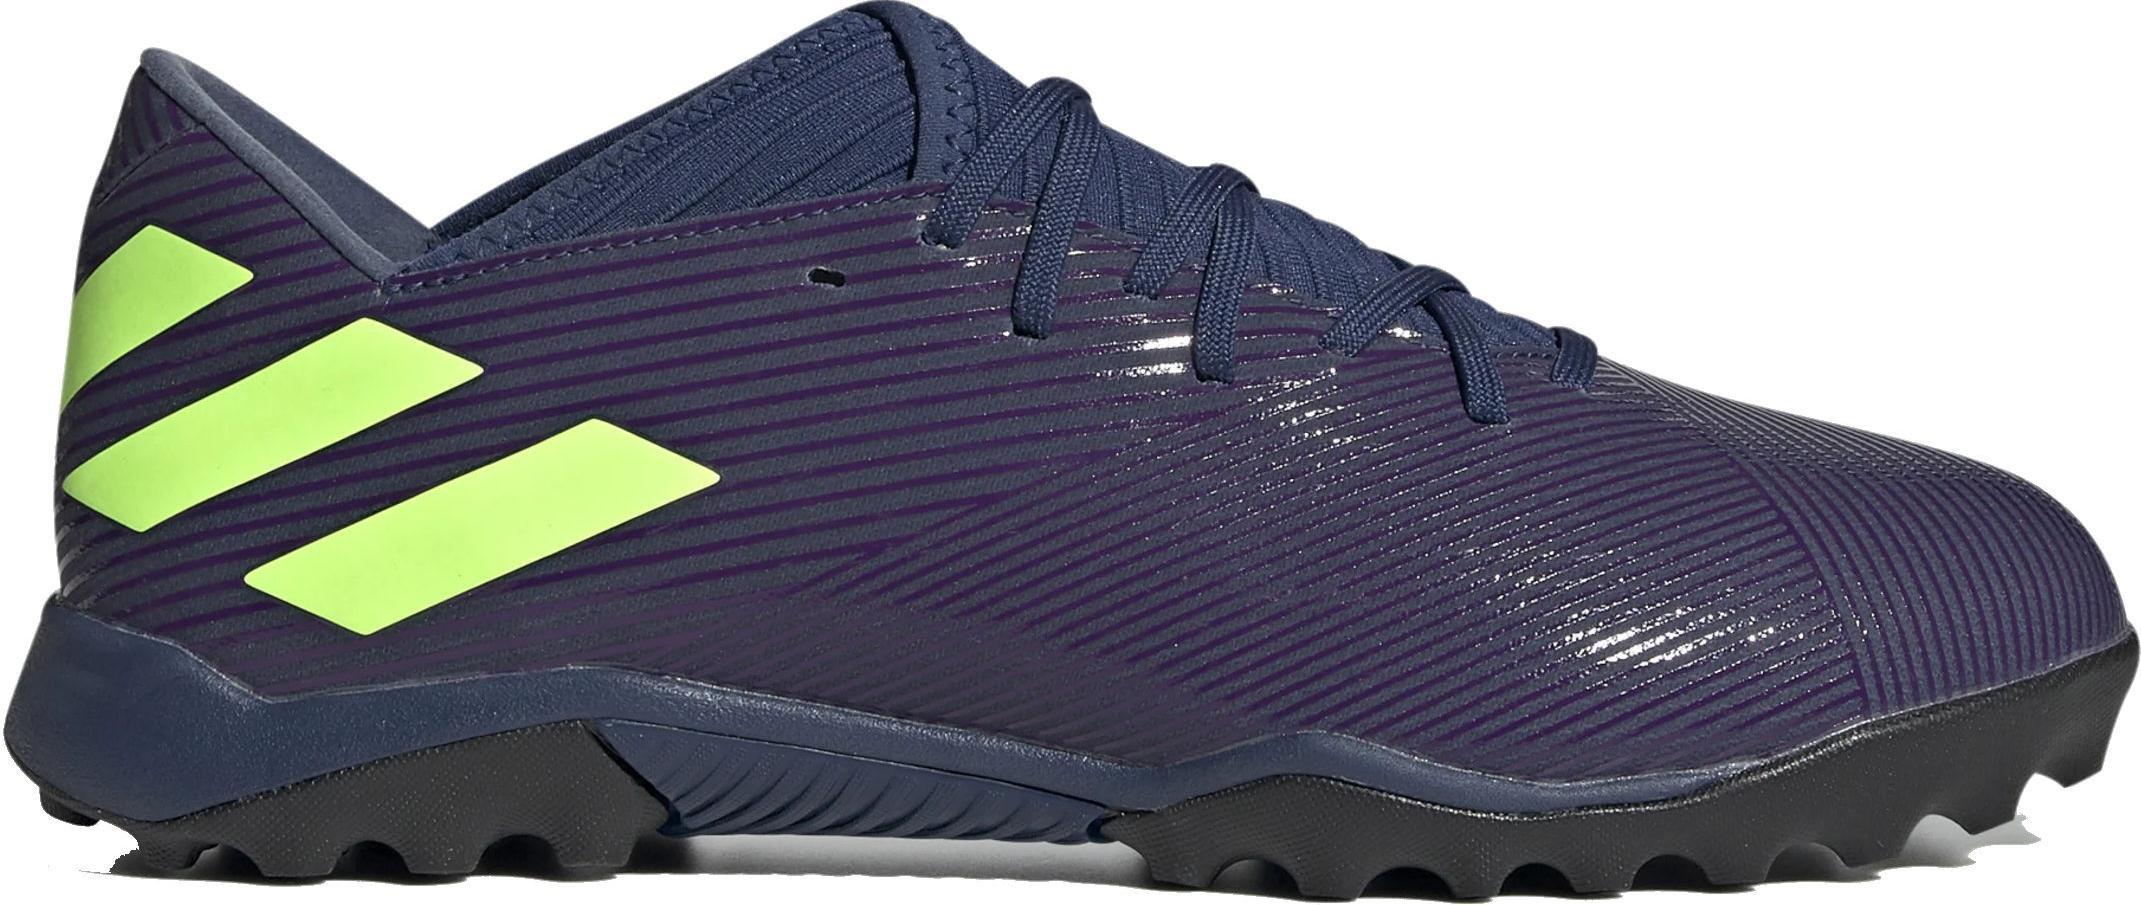 Kopačky adidas NEMEZIZ MESSI 19.3 TF